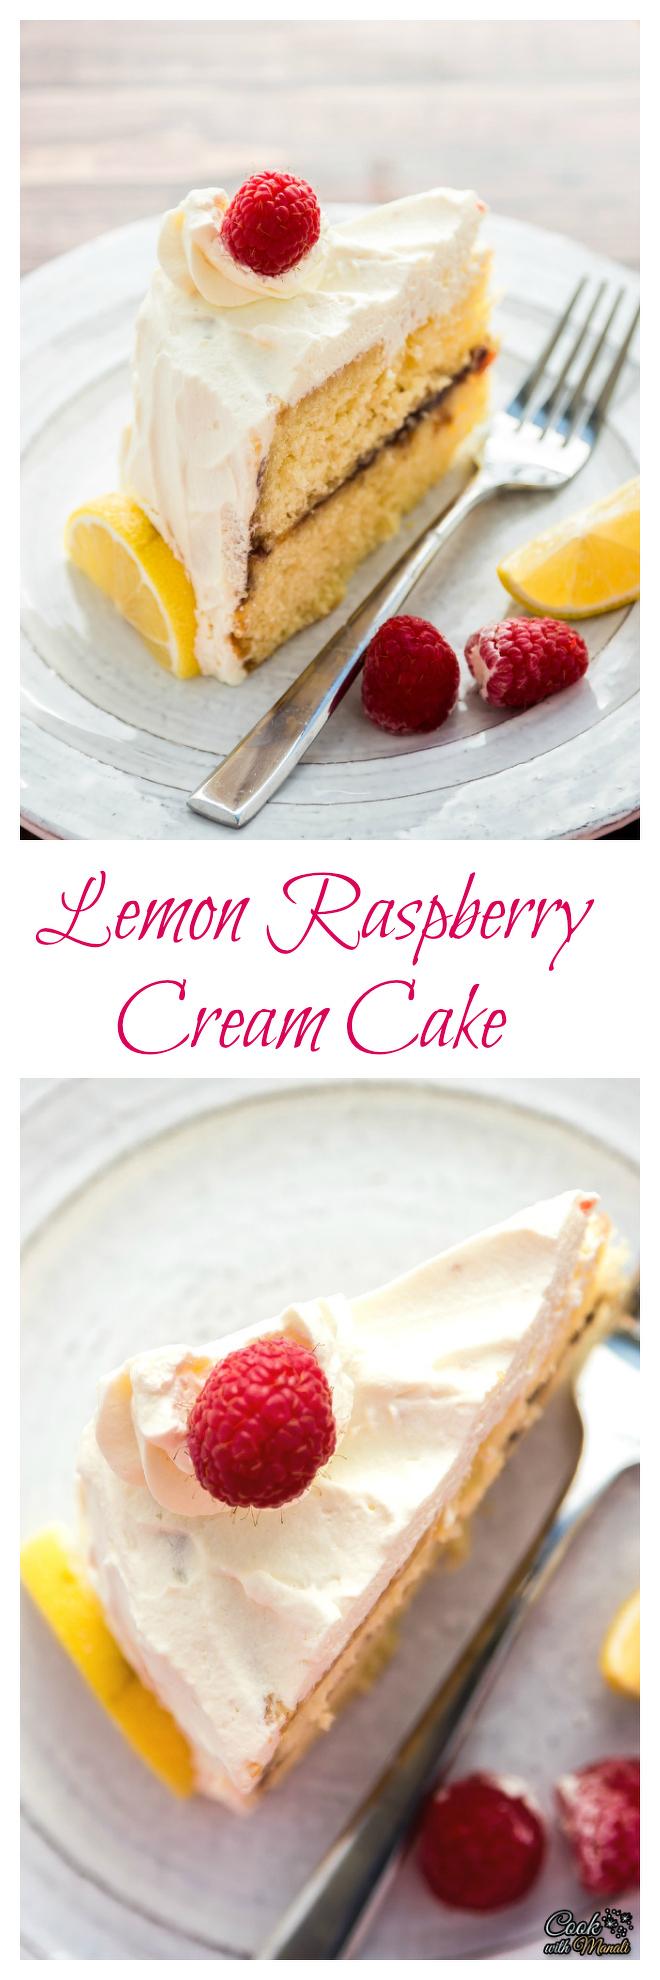 Lemon-Raspberry-Cream-Cake-Collage-nocwm